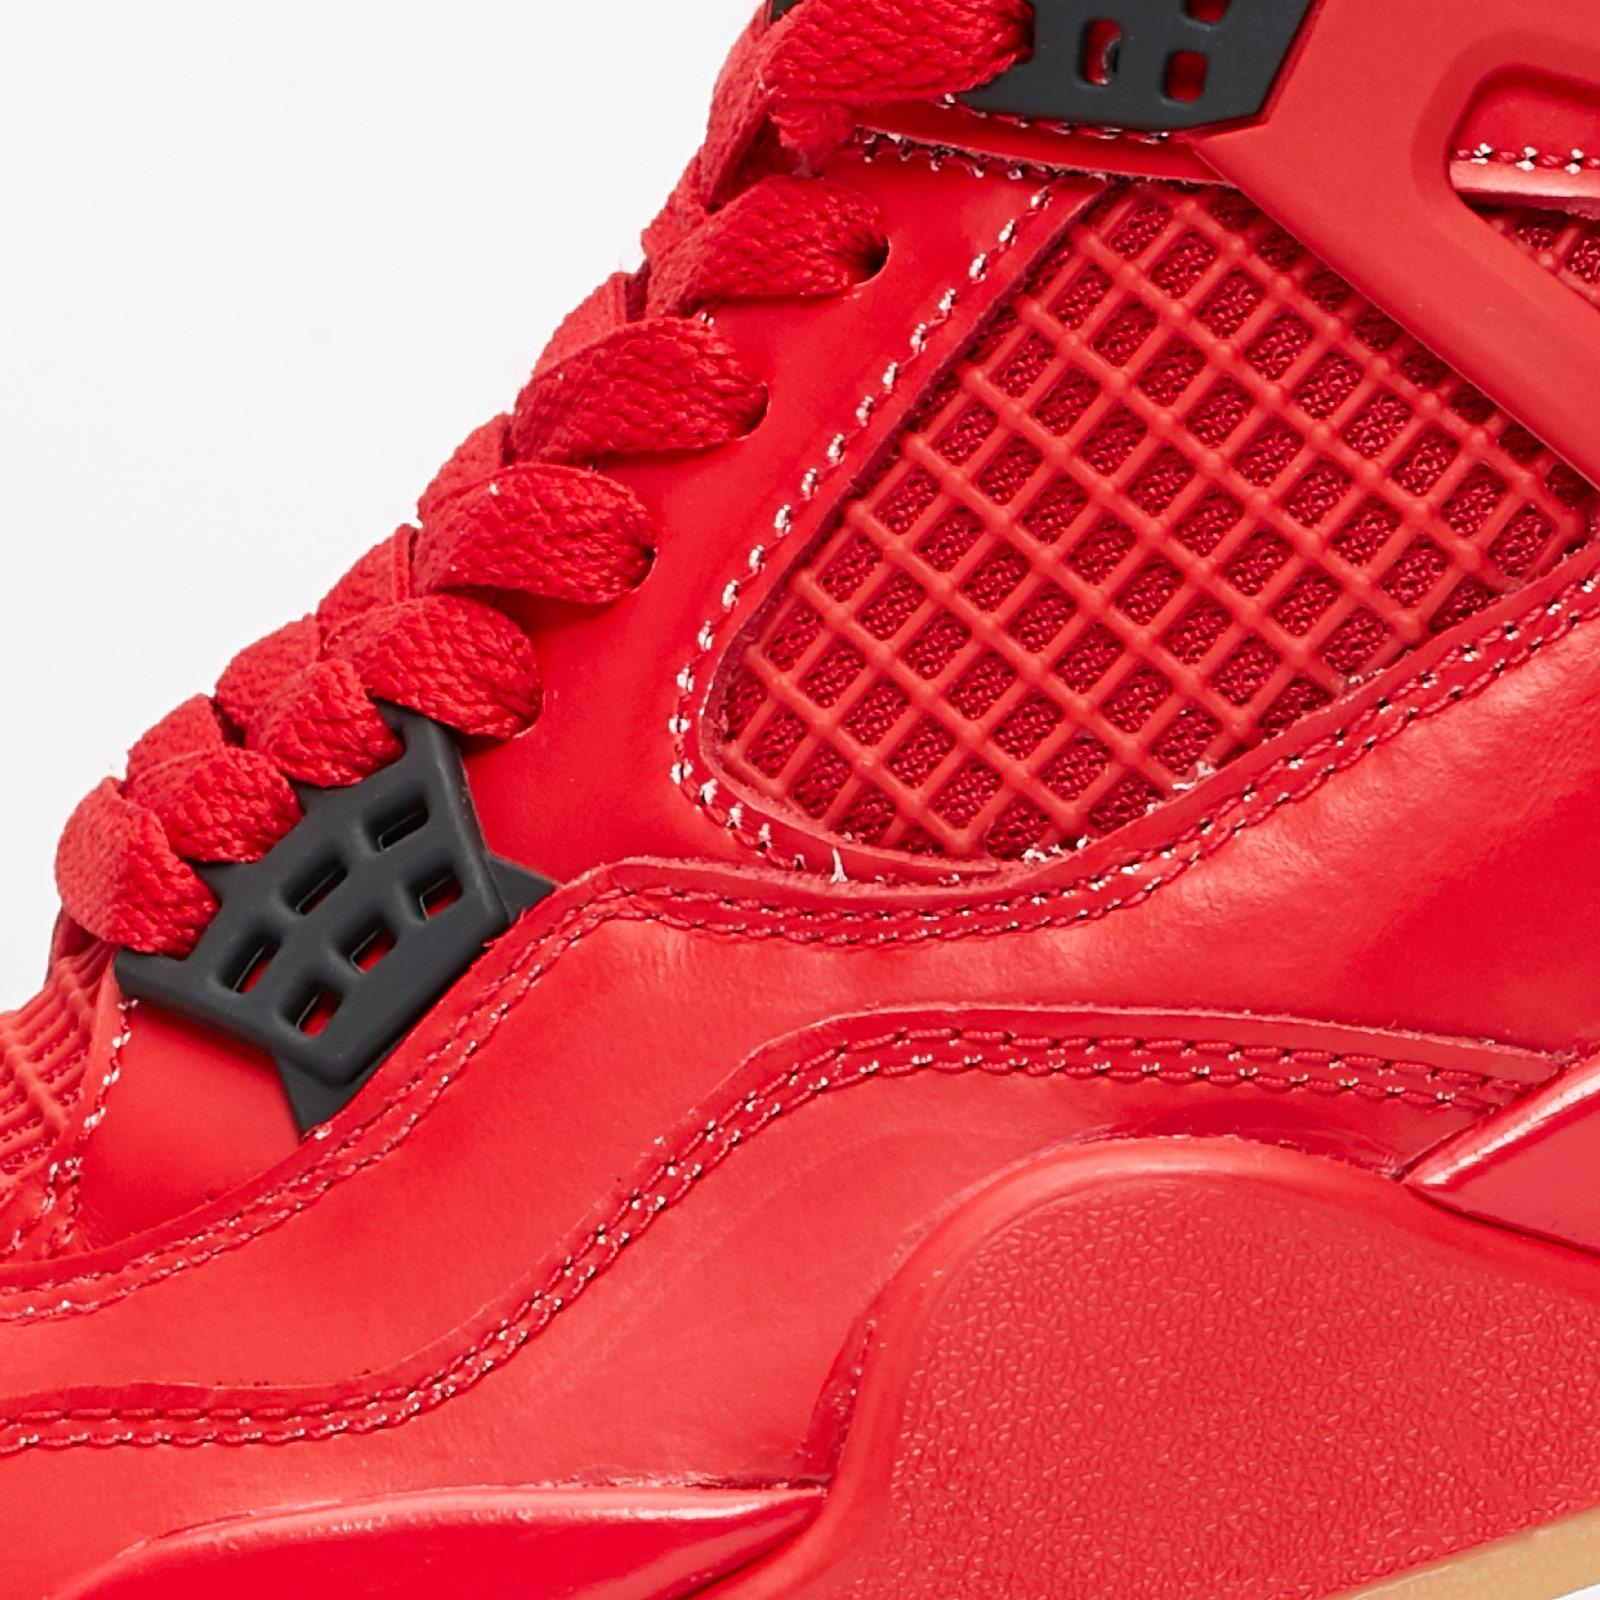 d726d4114a0 Jordan Brand Wmns Air Jordan 4 Retro NRG - Av3914-600 ...